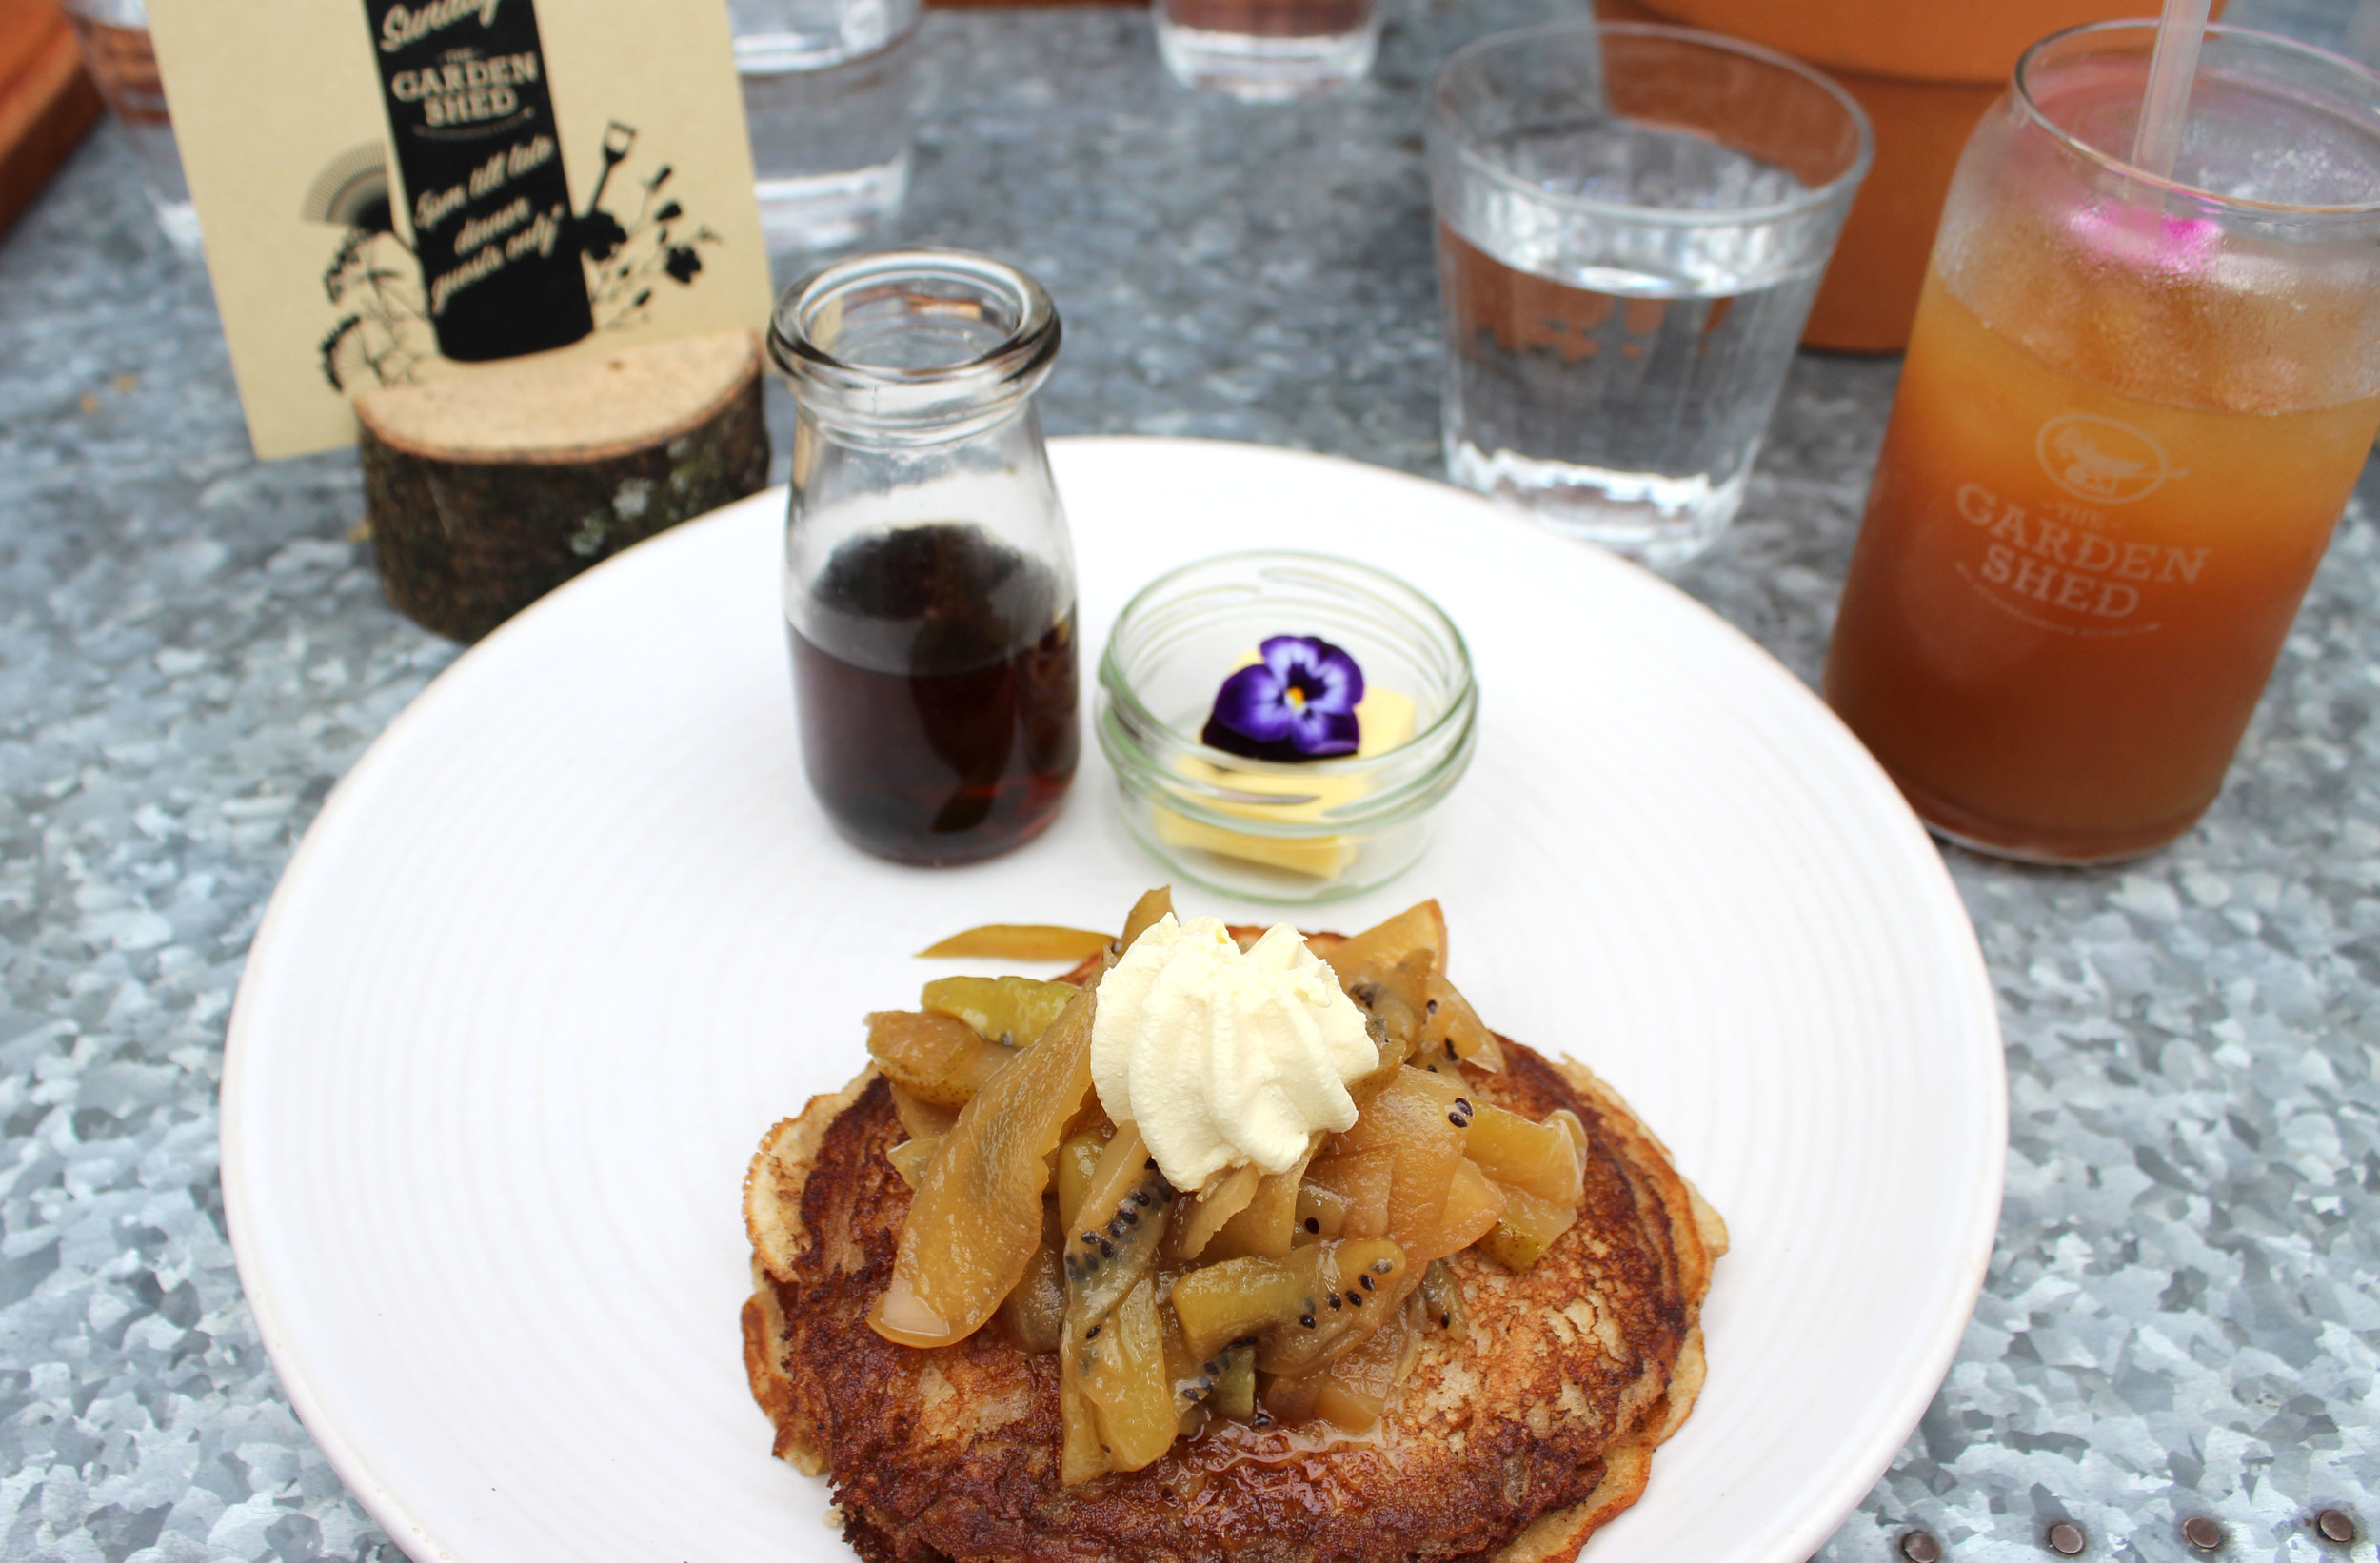 The Garden Shed Buckwheat Pancakes | EmmaLouisa.com